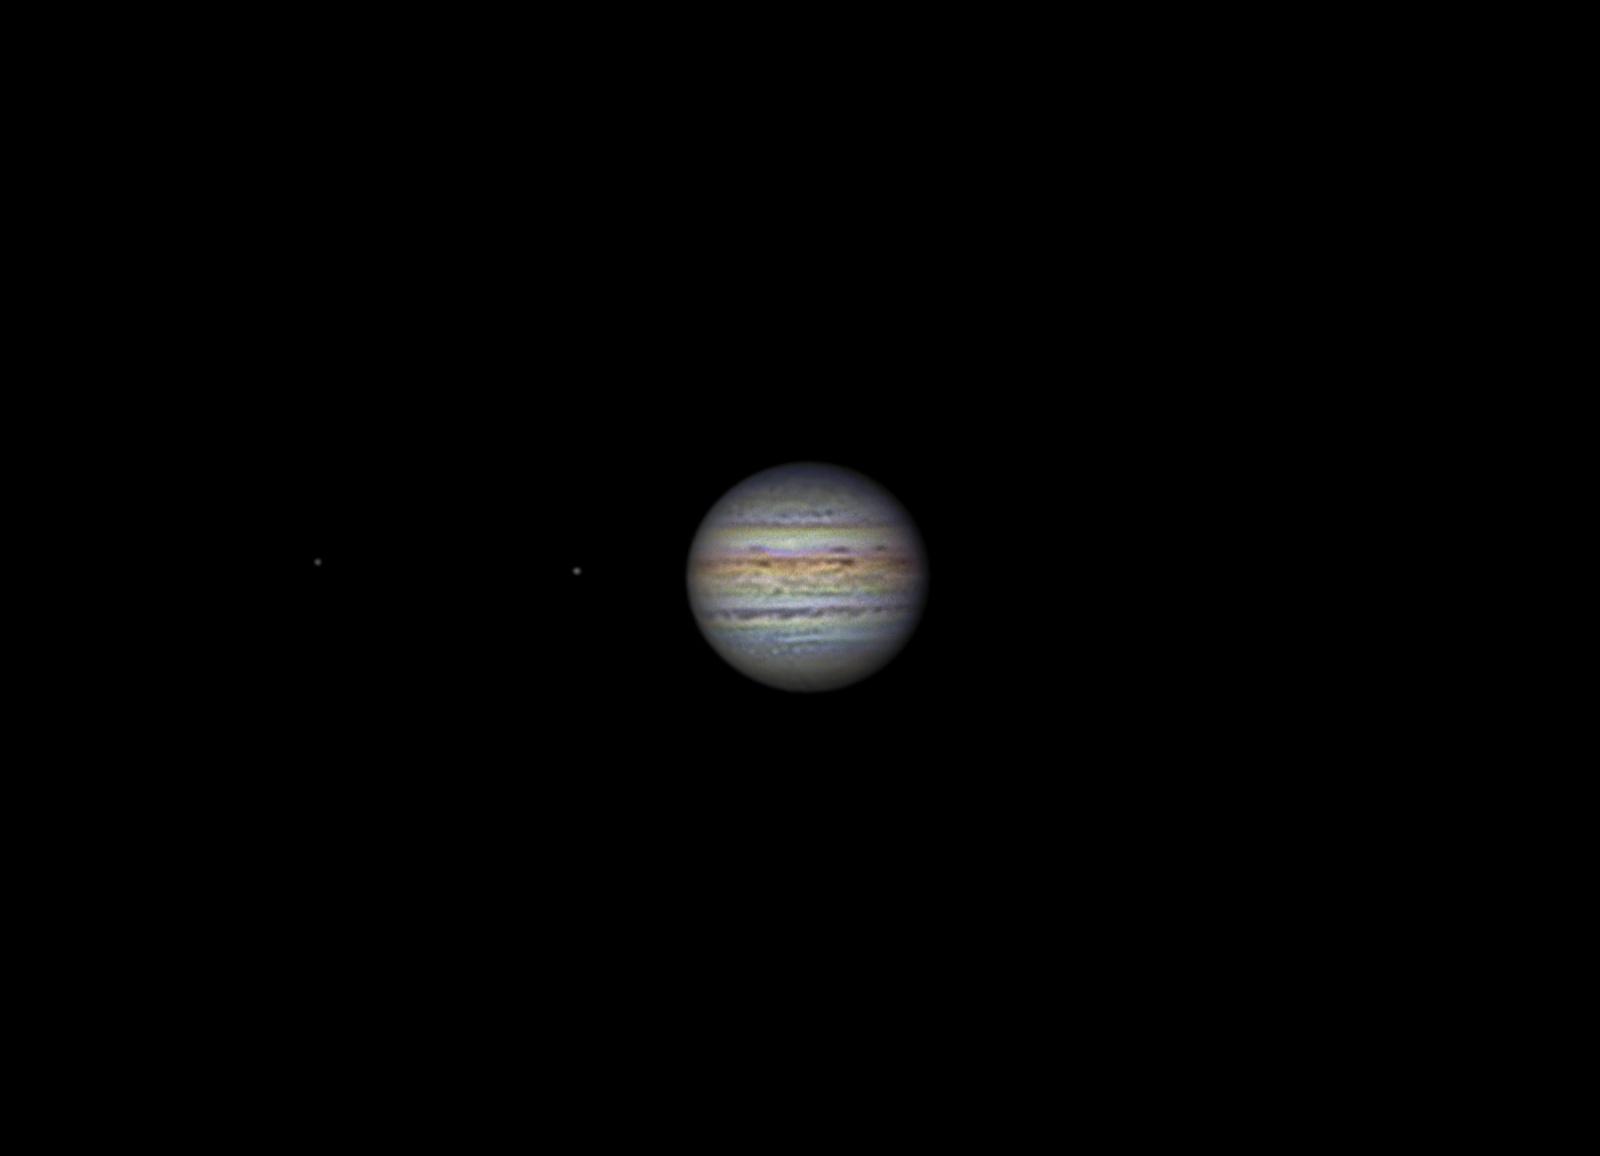 jowisz-2021-06-28--002.thumb.jpg.cbe69b293ef7b15403c26171a86b3749.jpg